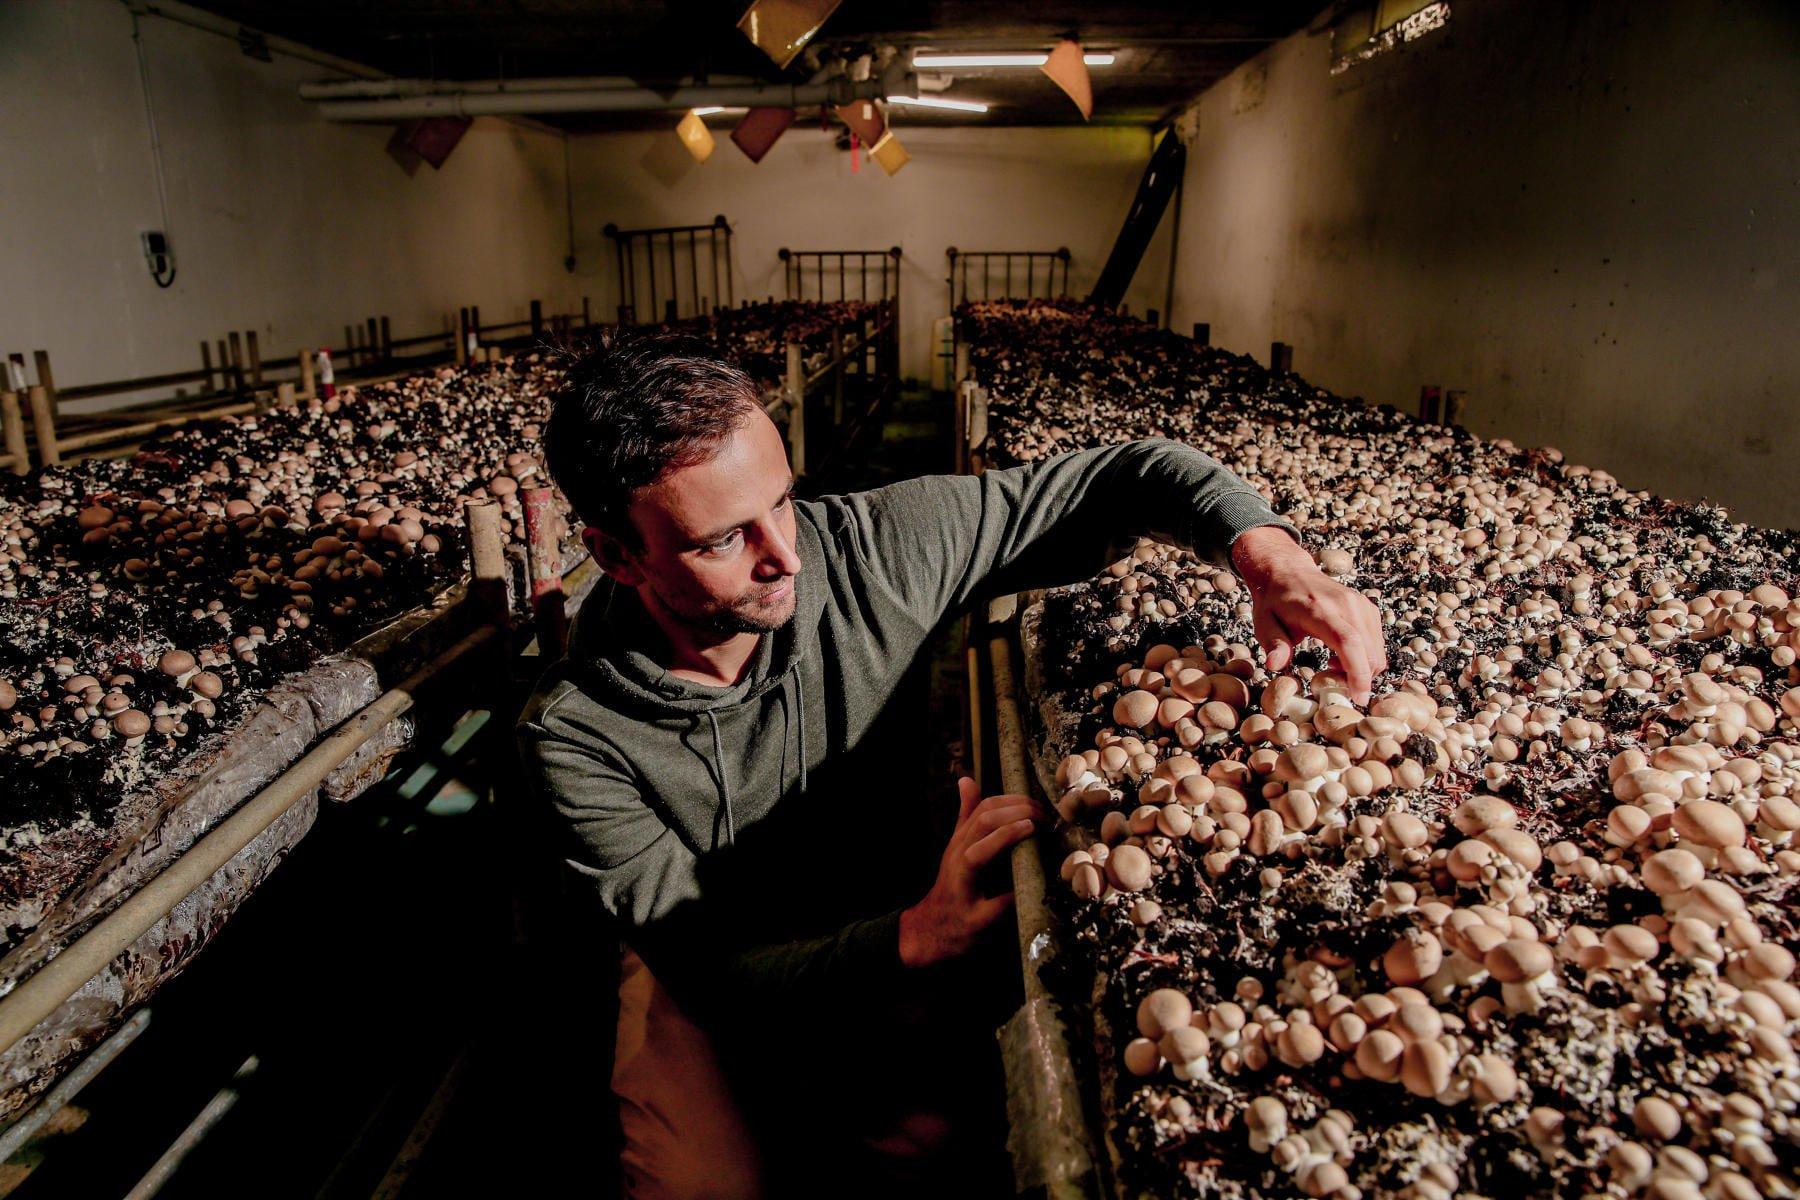 Cycloponics, coltivazione di funghi negli ex garage di P